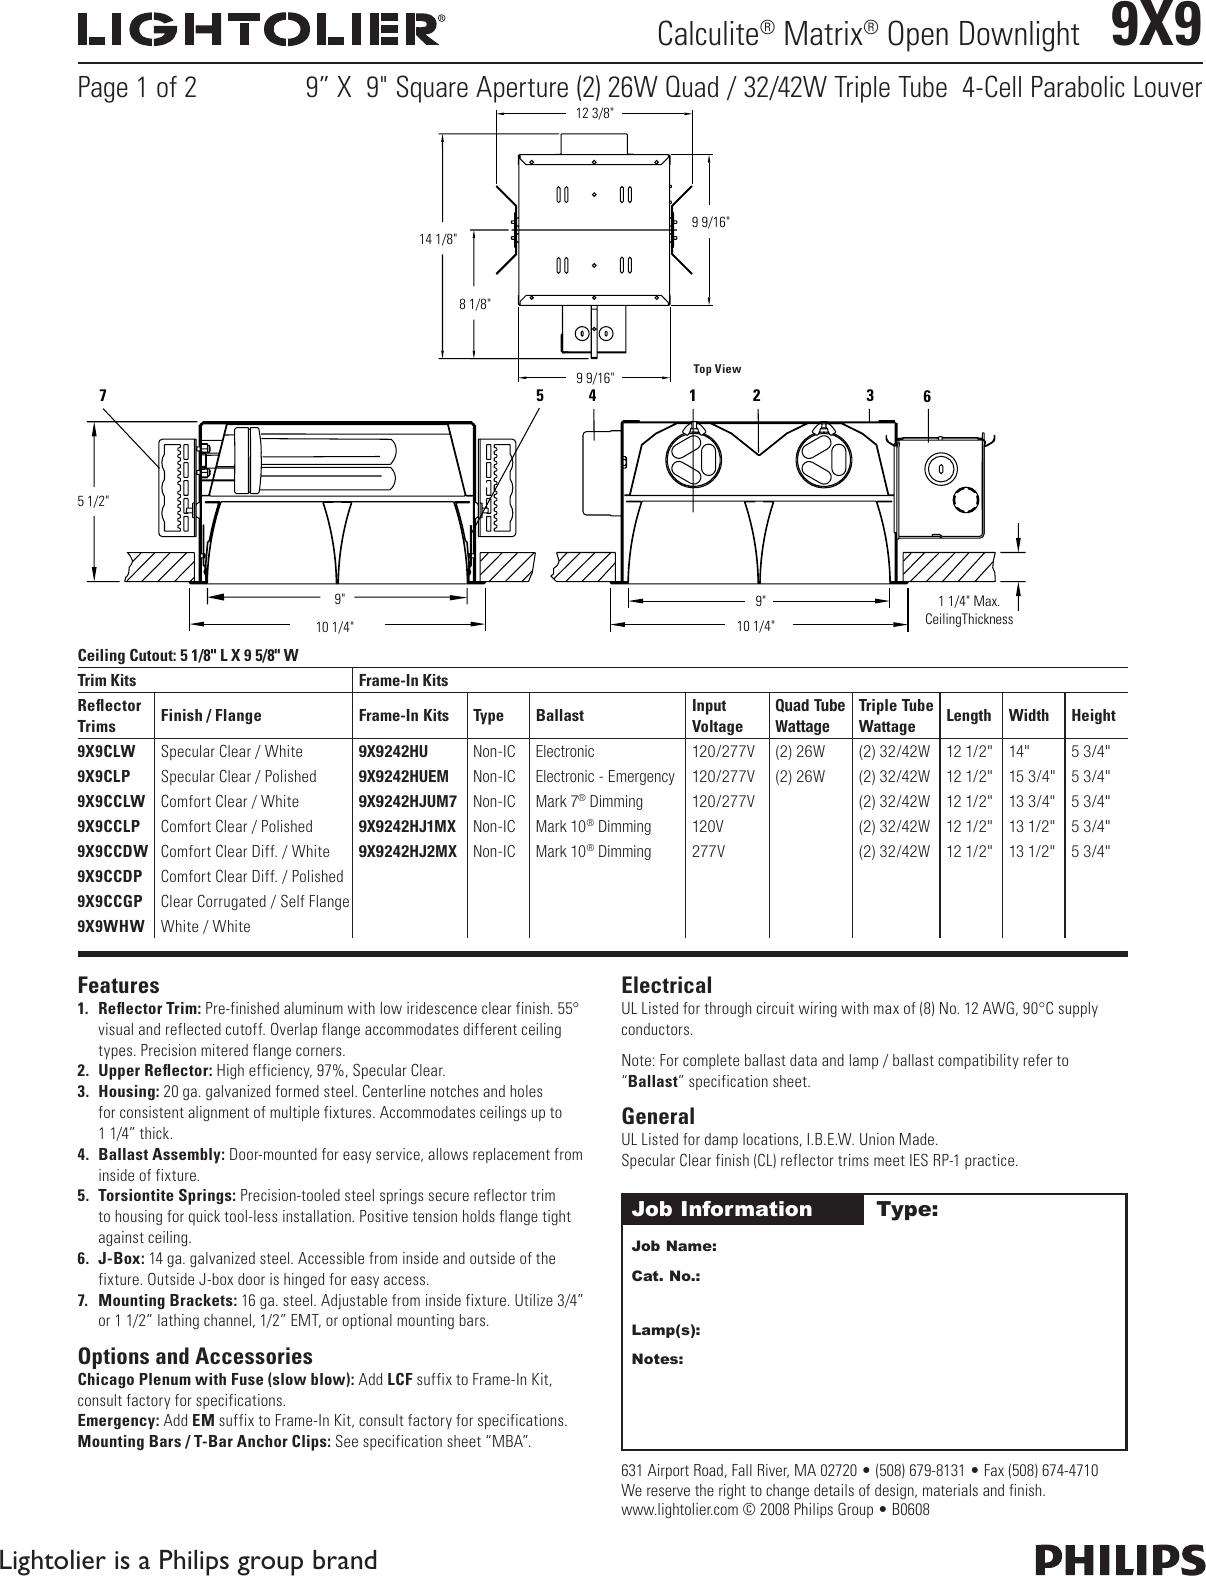 Dms 2003 O 9 Manual Guide